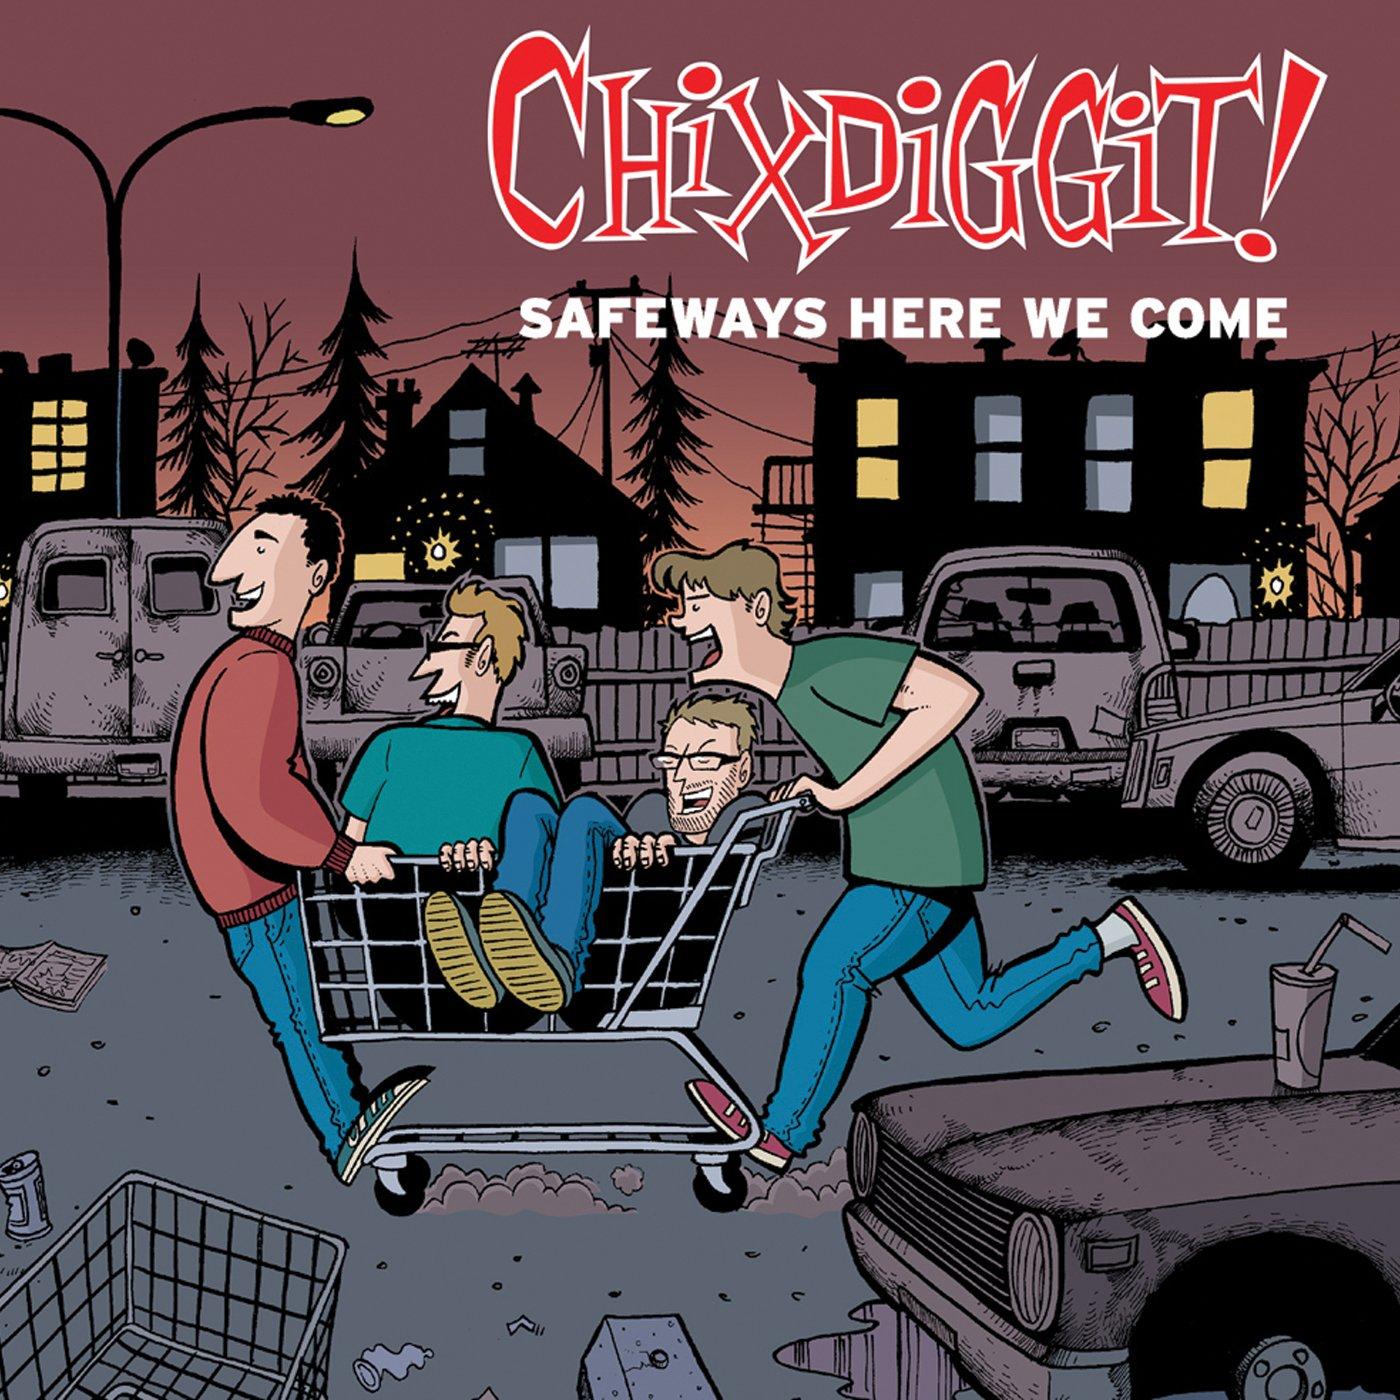 CD : Chixdiggit! - Safeways Here We Come (CD)